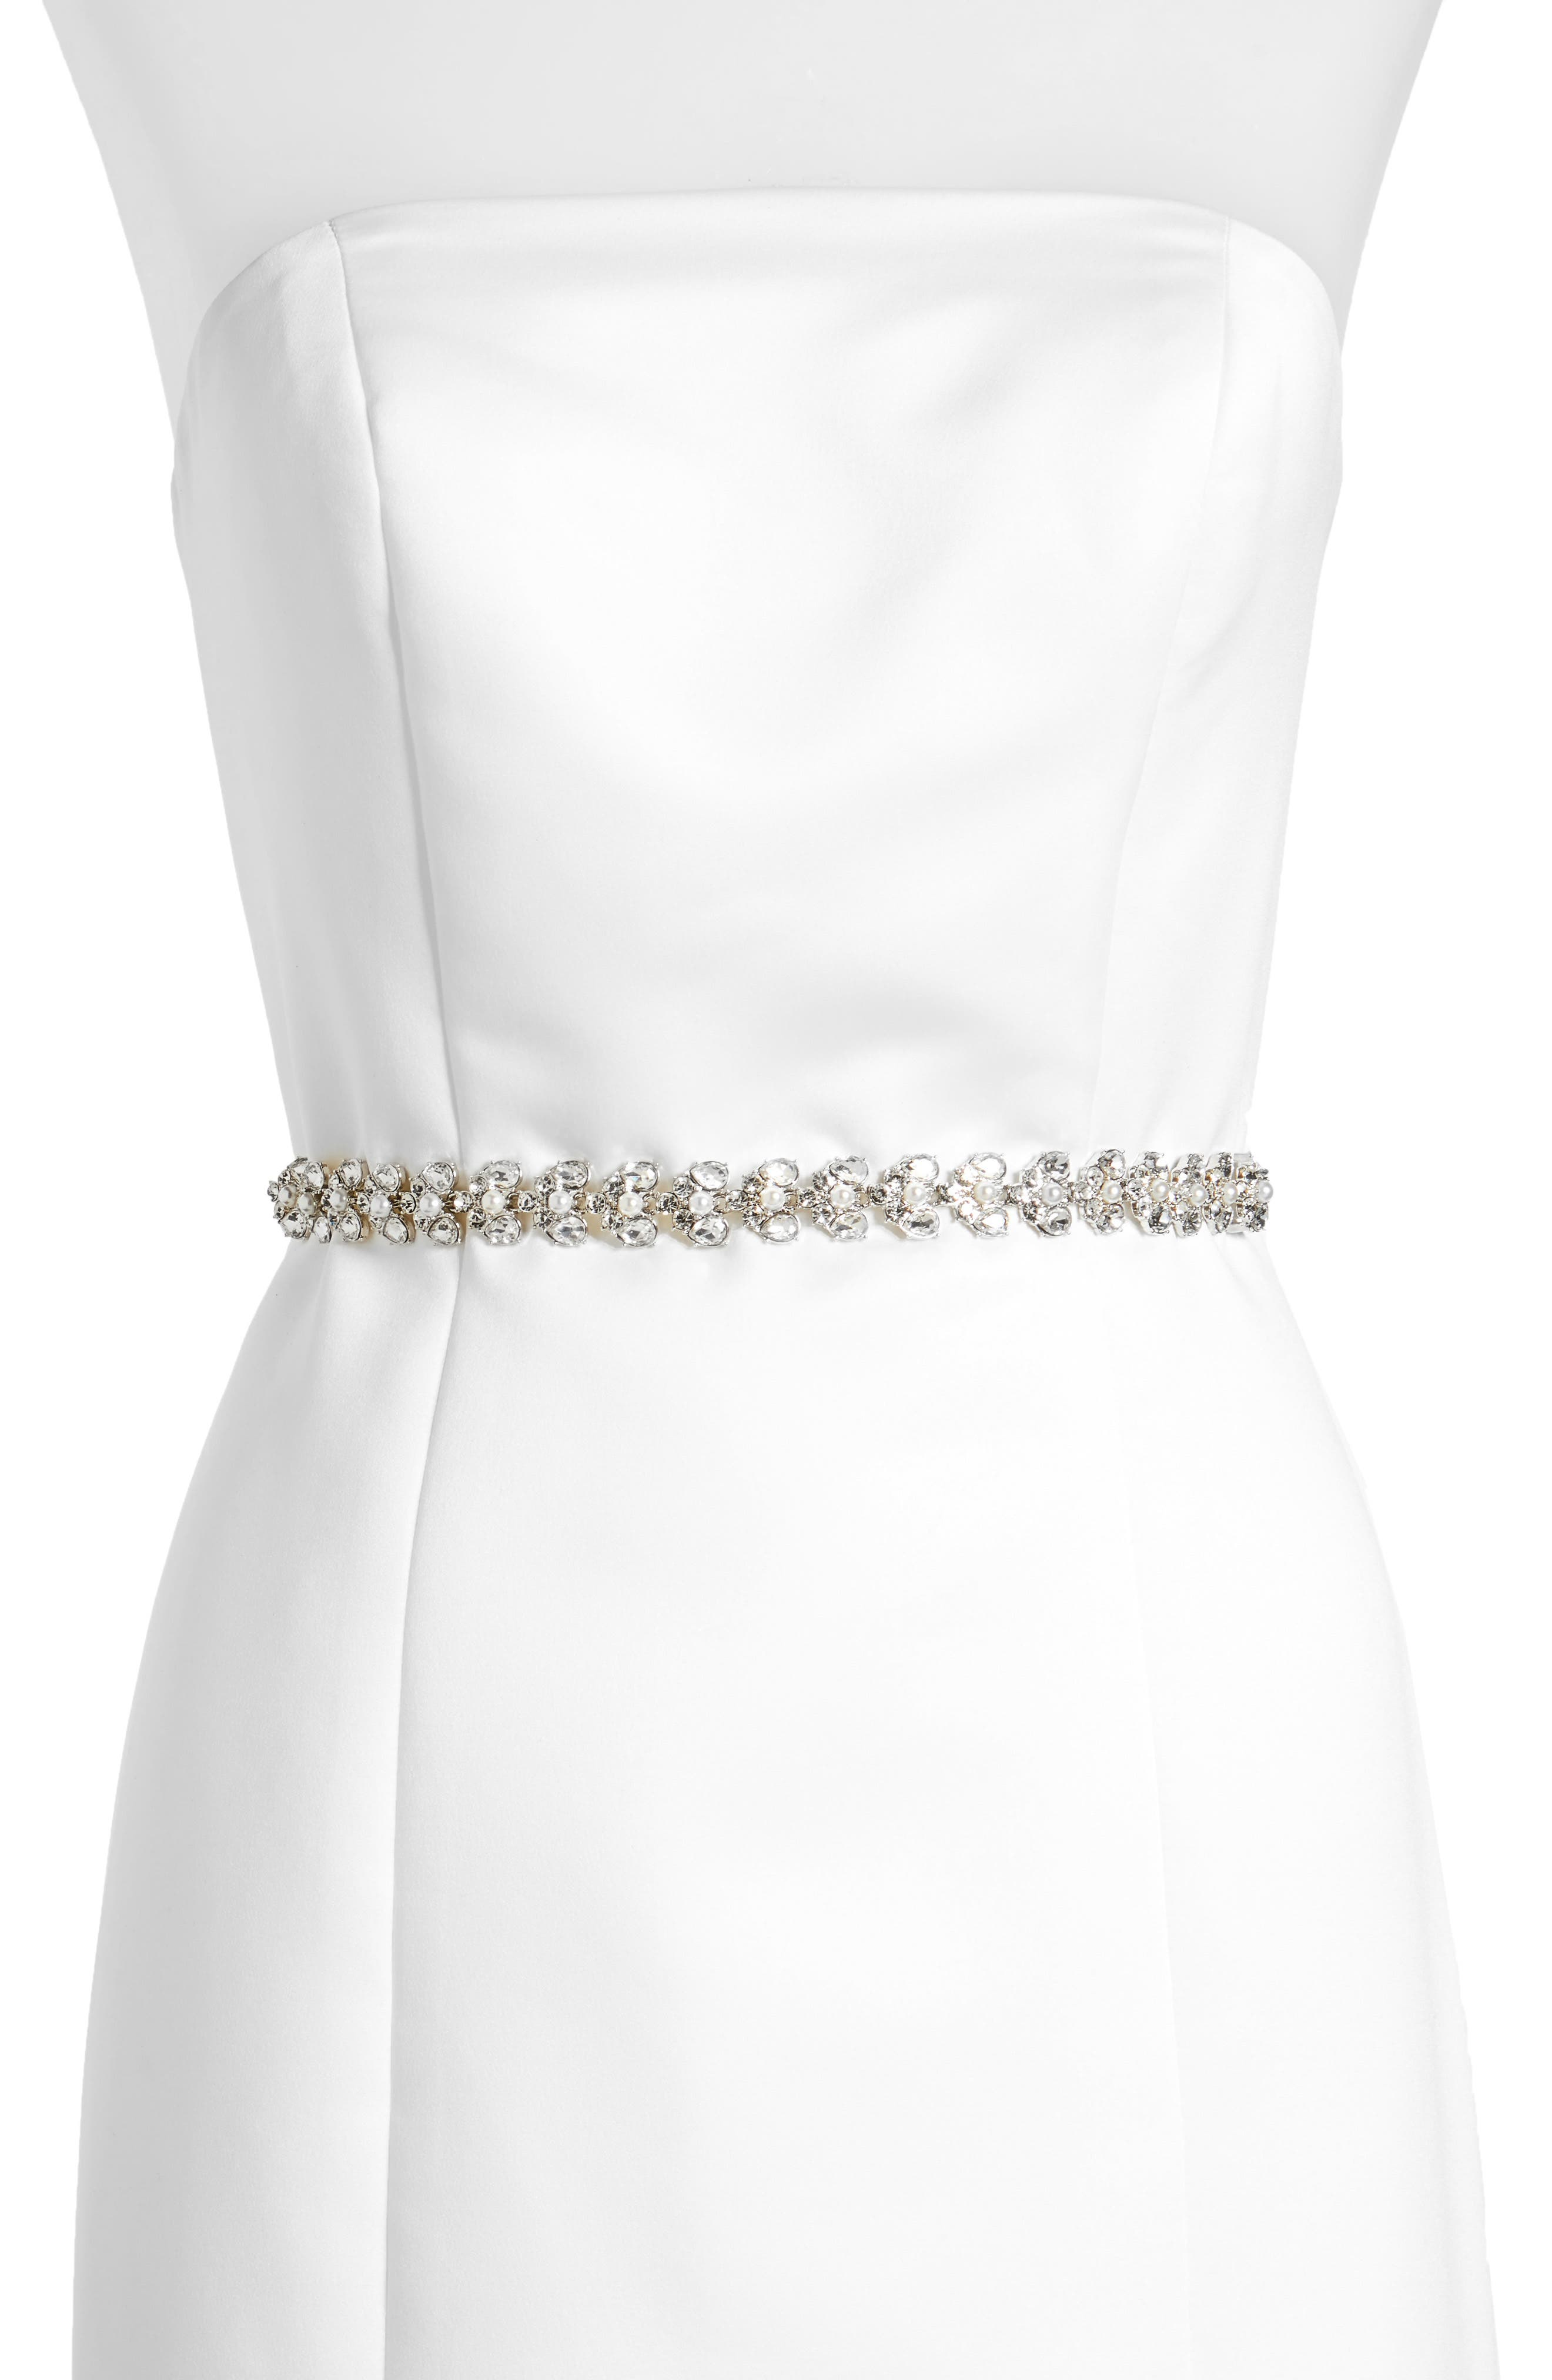 Kate Spade New York Crystal & Imitation Pearl Belt, Cream/ Crystal/ Nickel